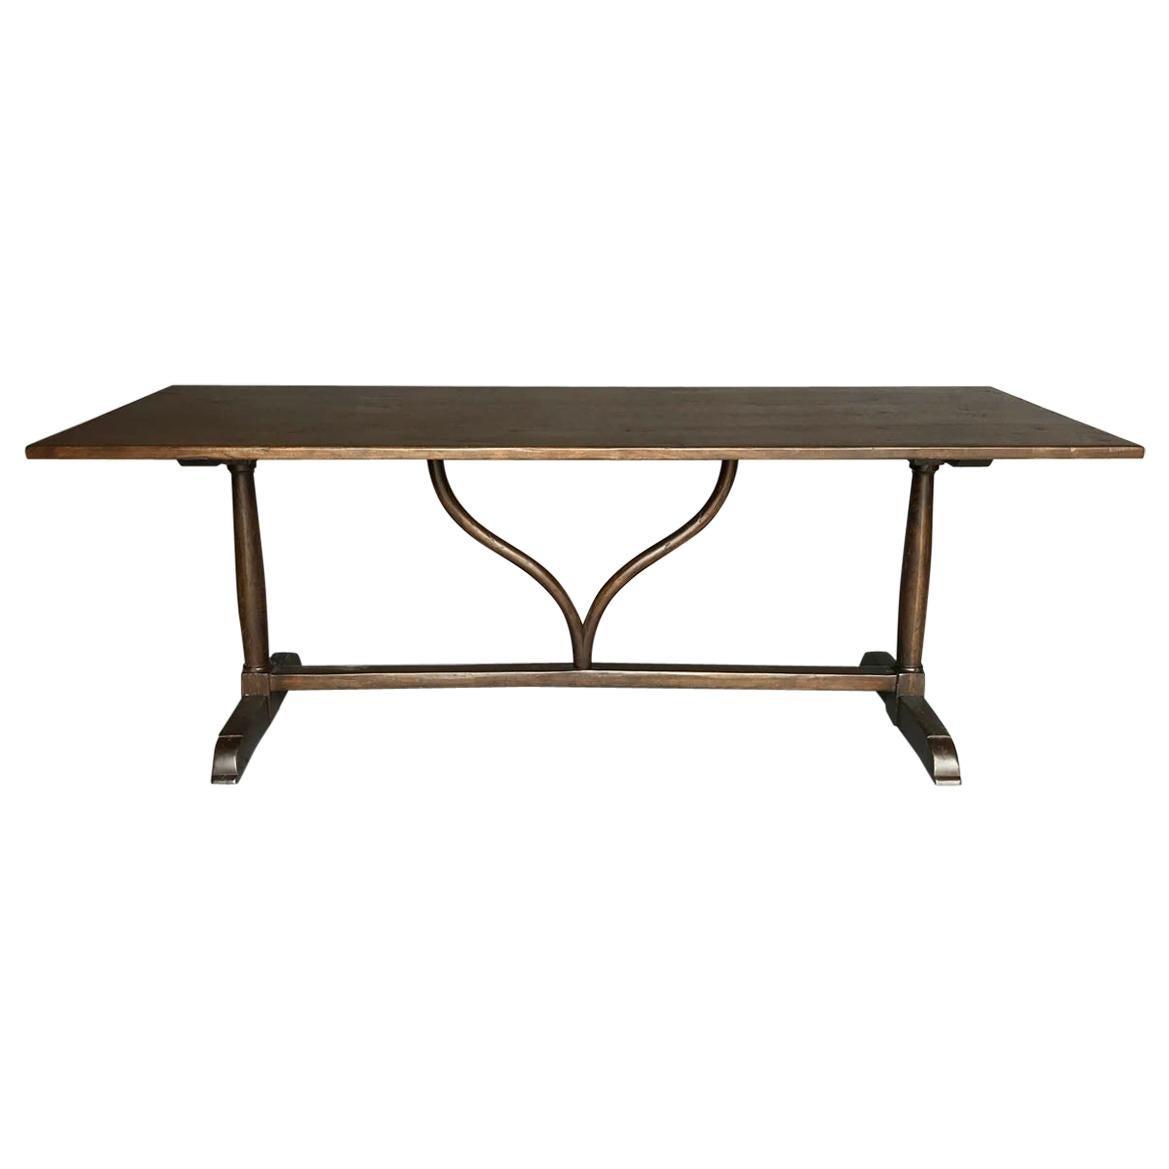 Custom Walnut Desk or Dining Table with Wishbone Stretcher